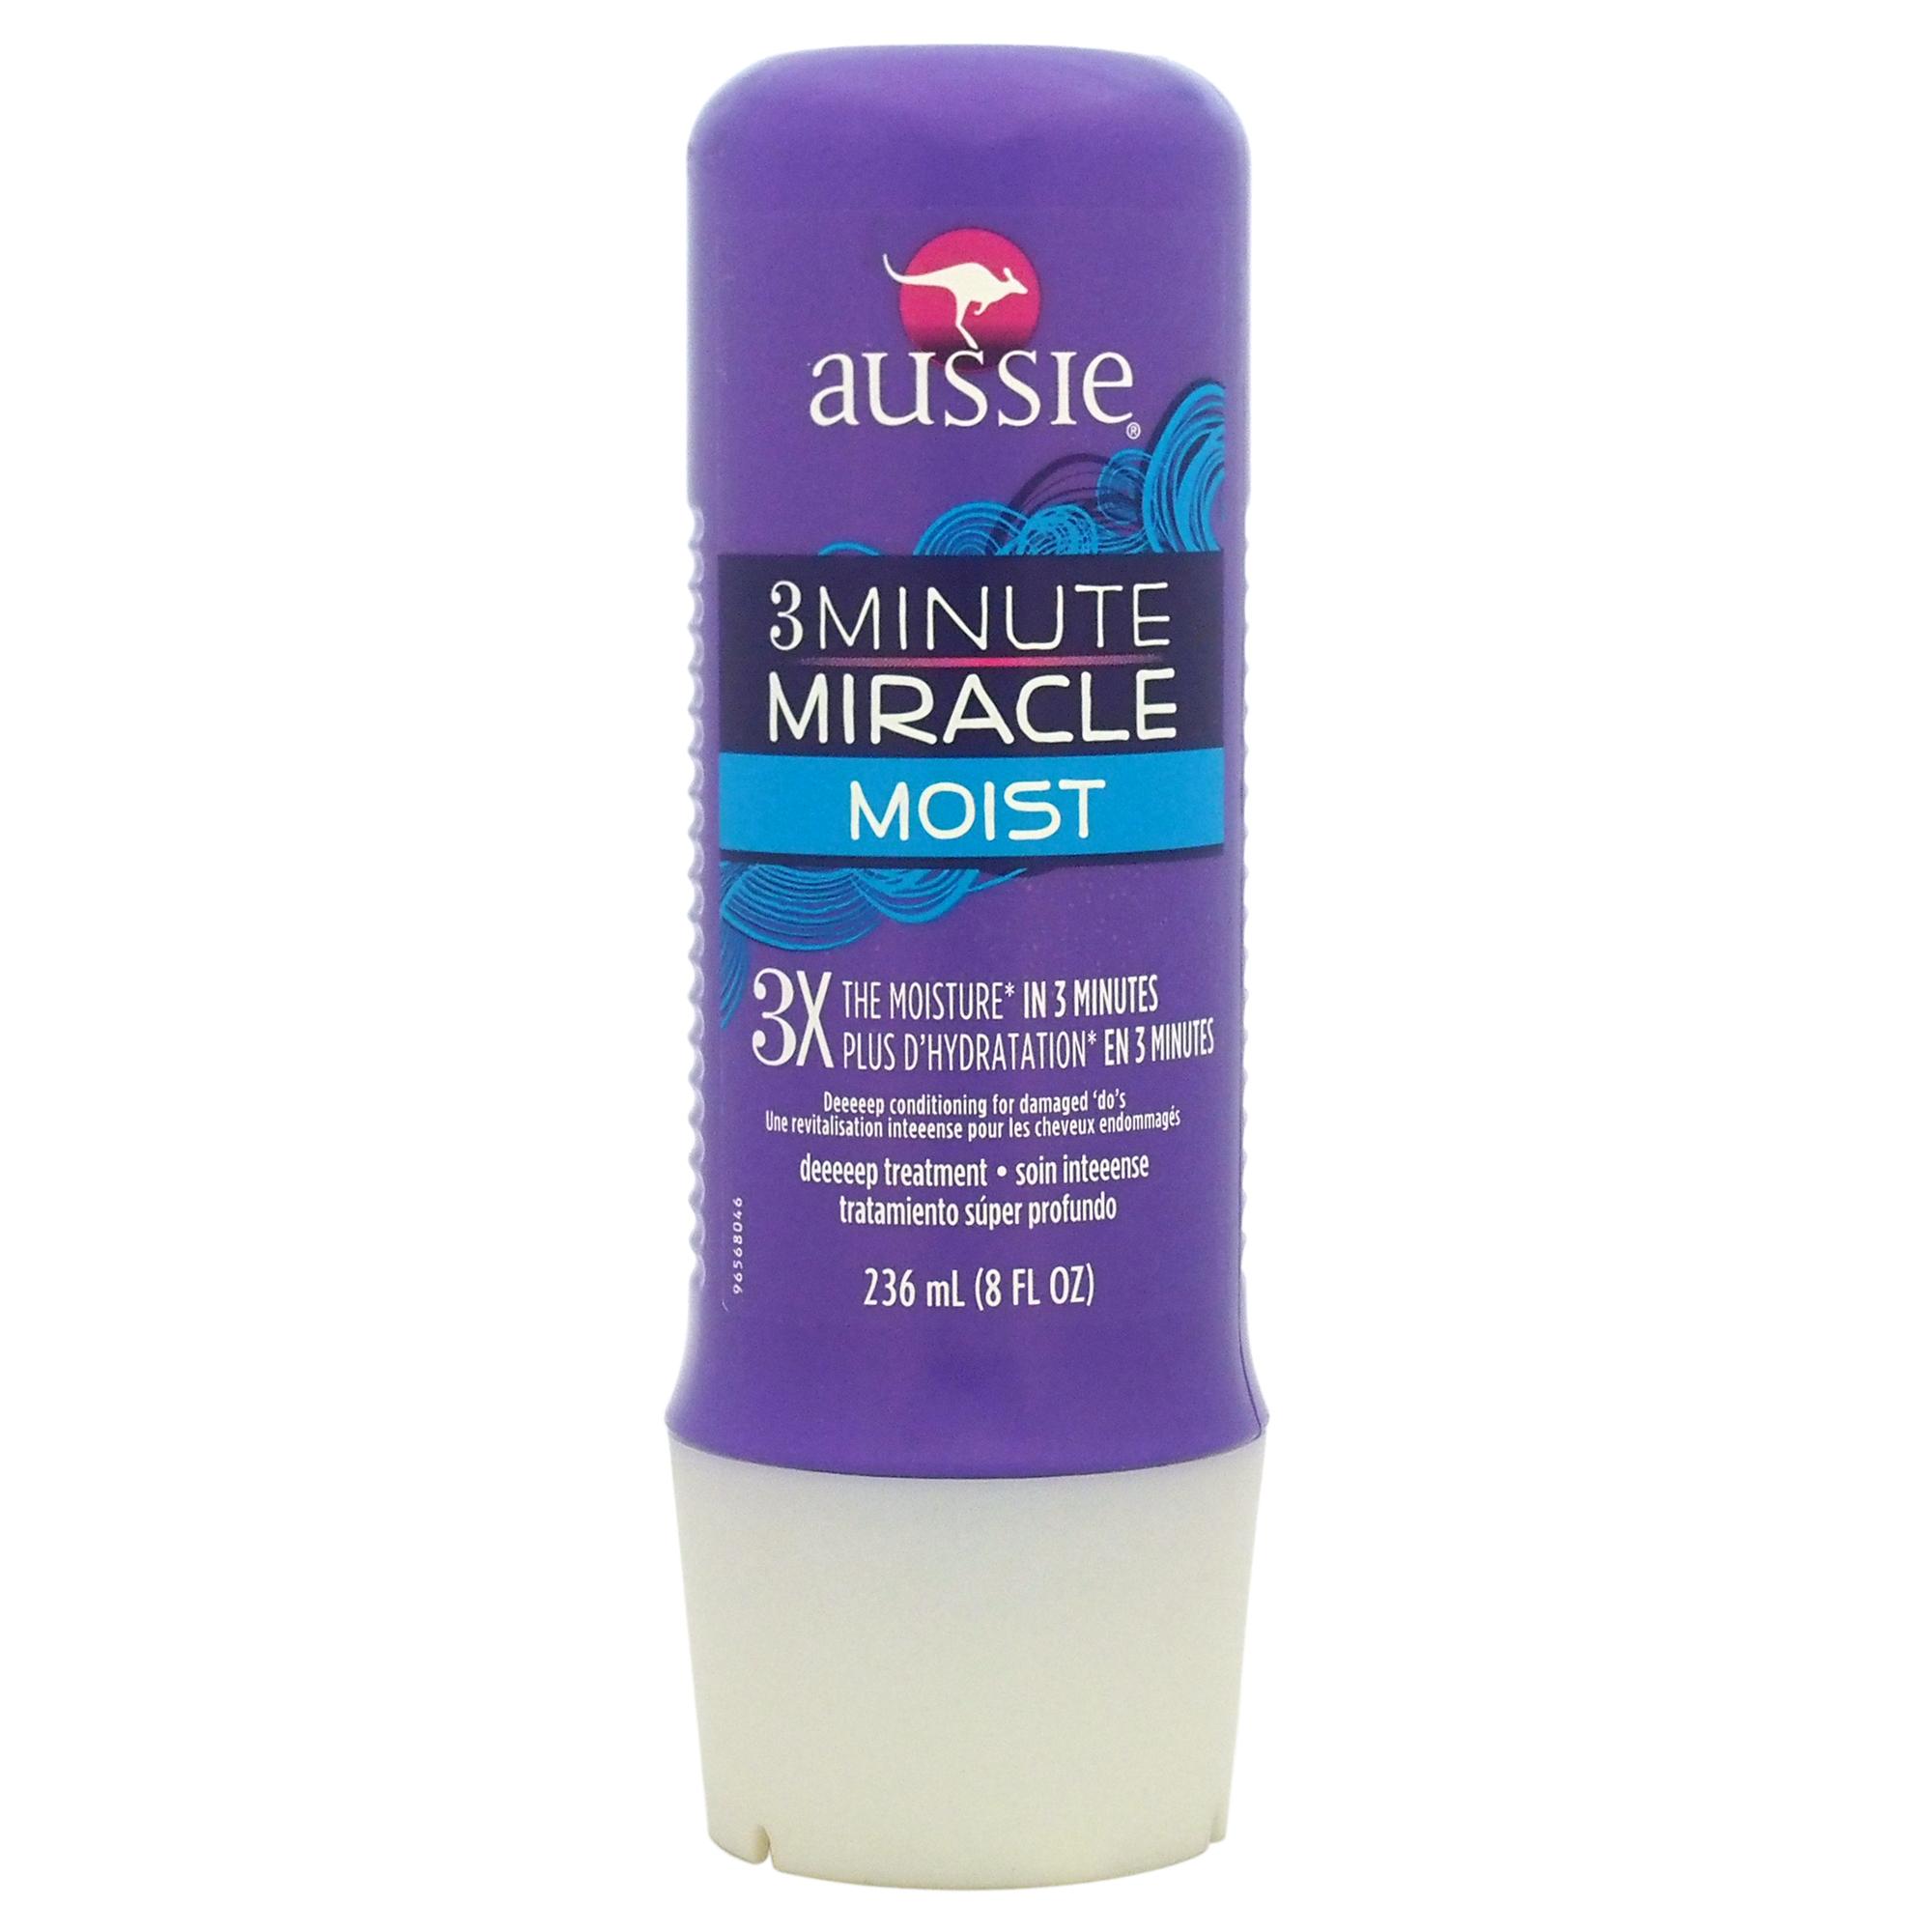 Aussie Moist 3 Minute Miracle Deep Treatment